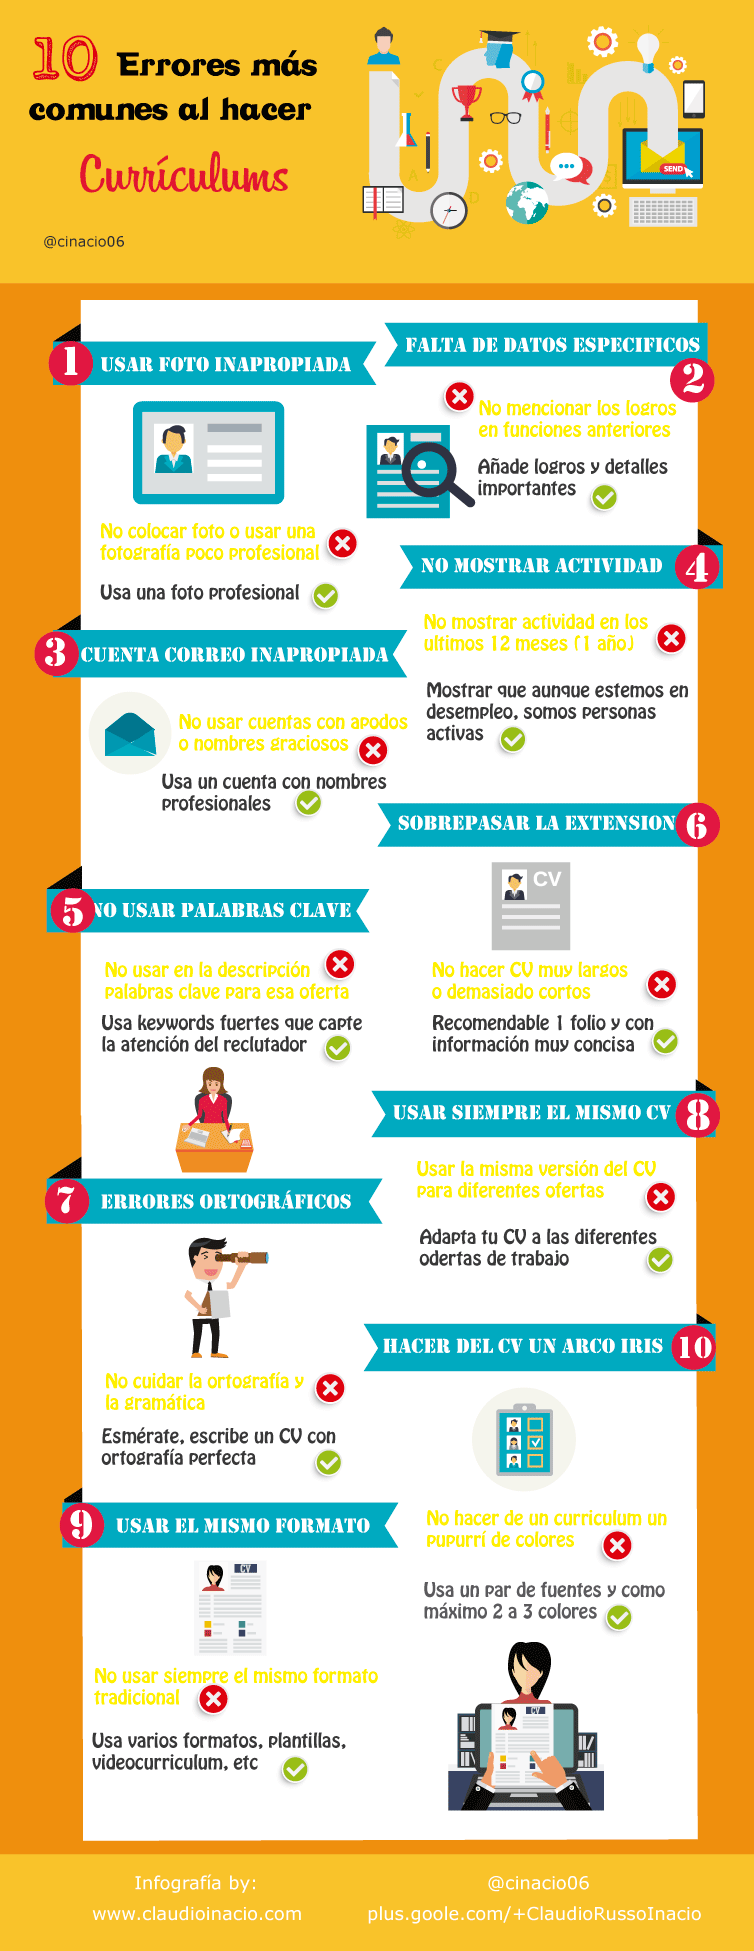 Curriculum Vitae - Cómo hacer un buen curriculum 2018 + Plantillas CV